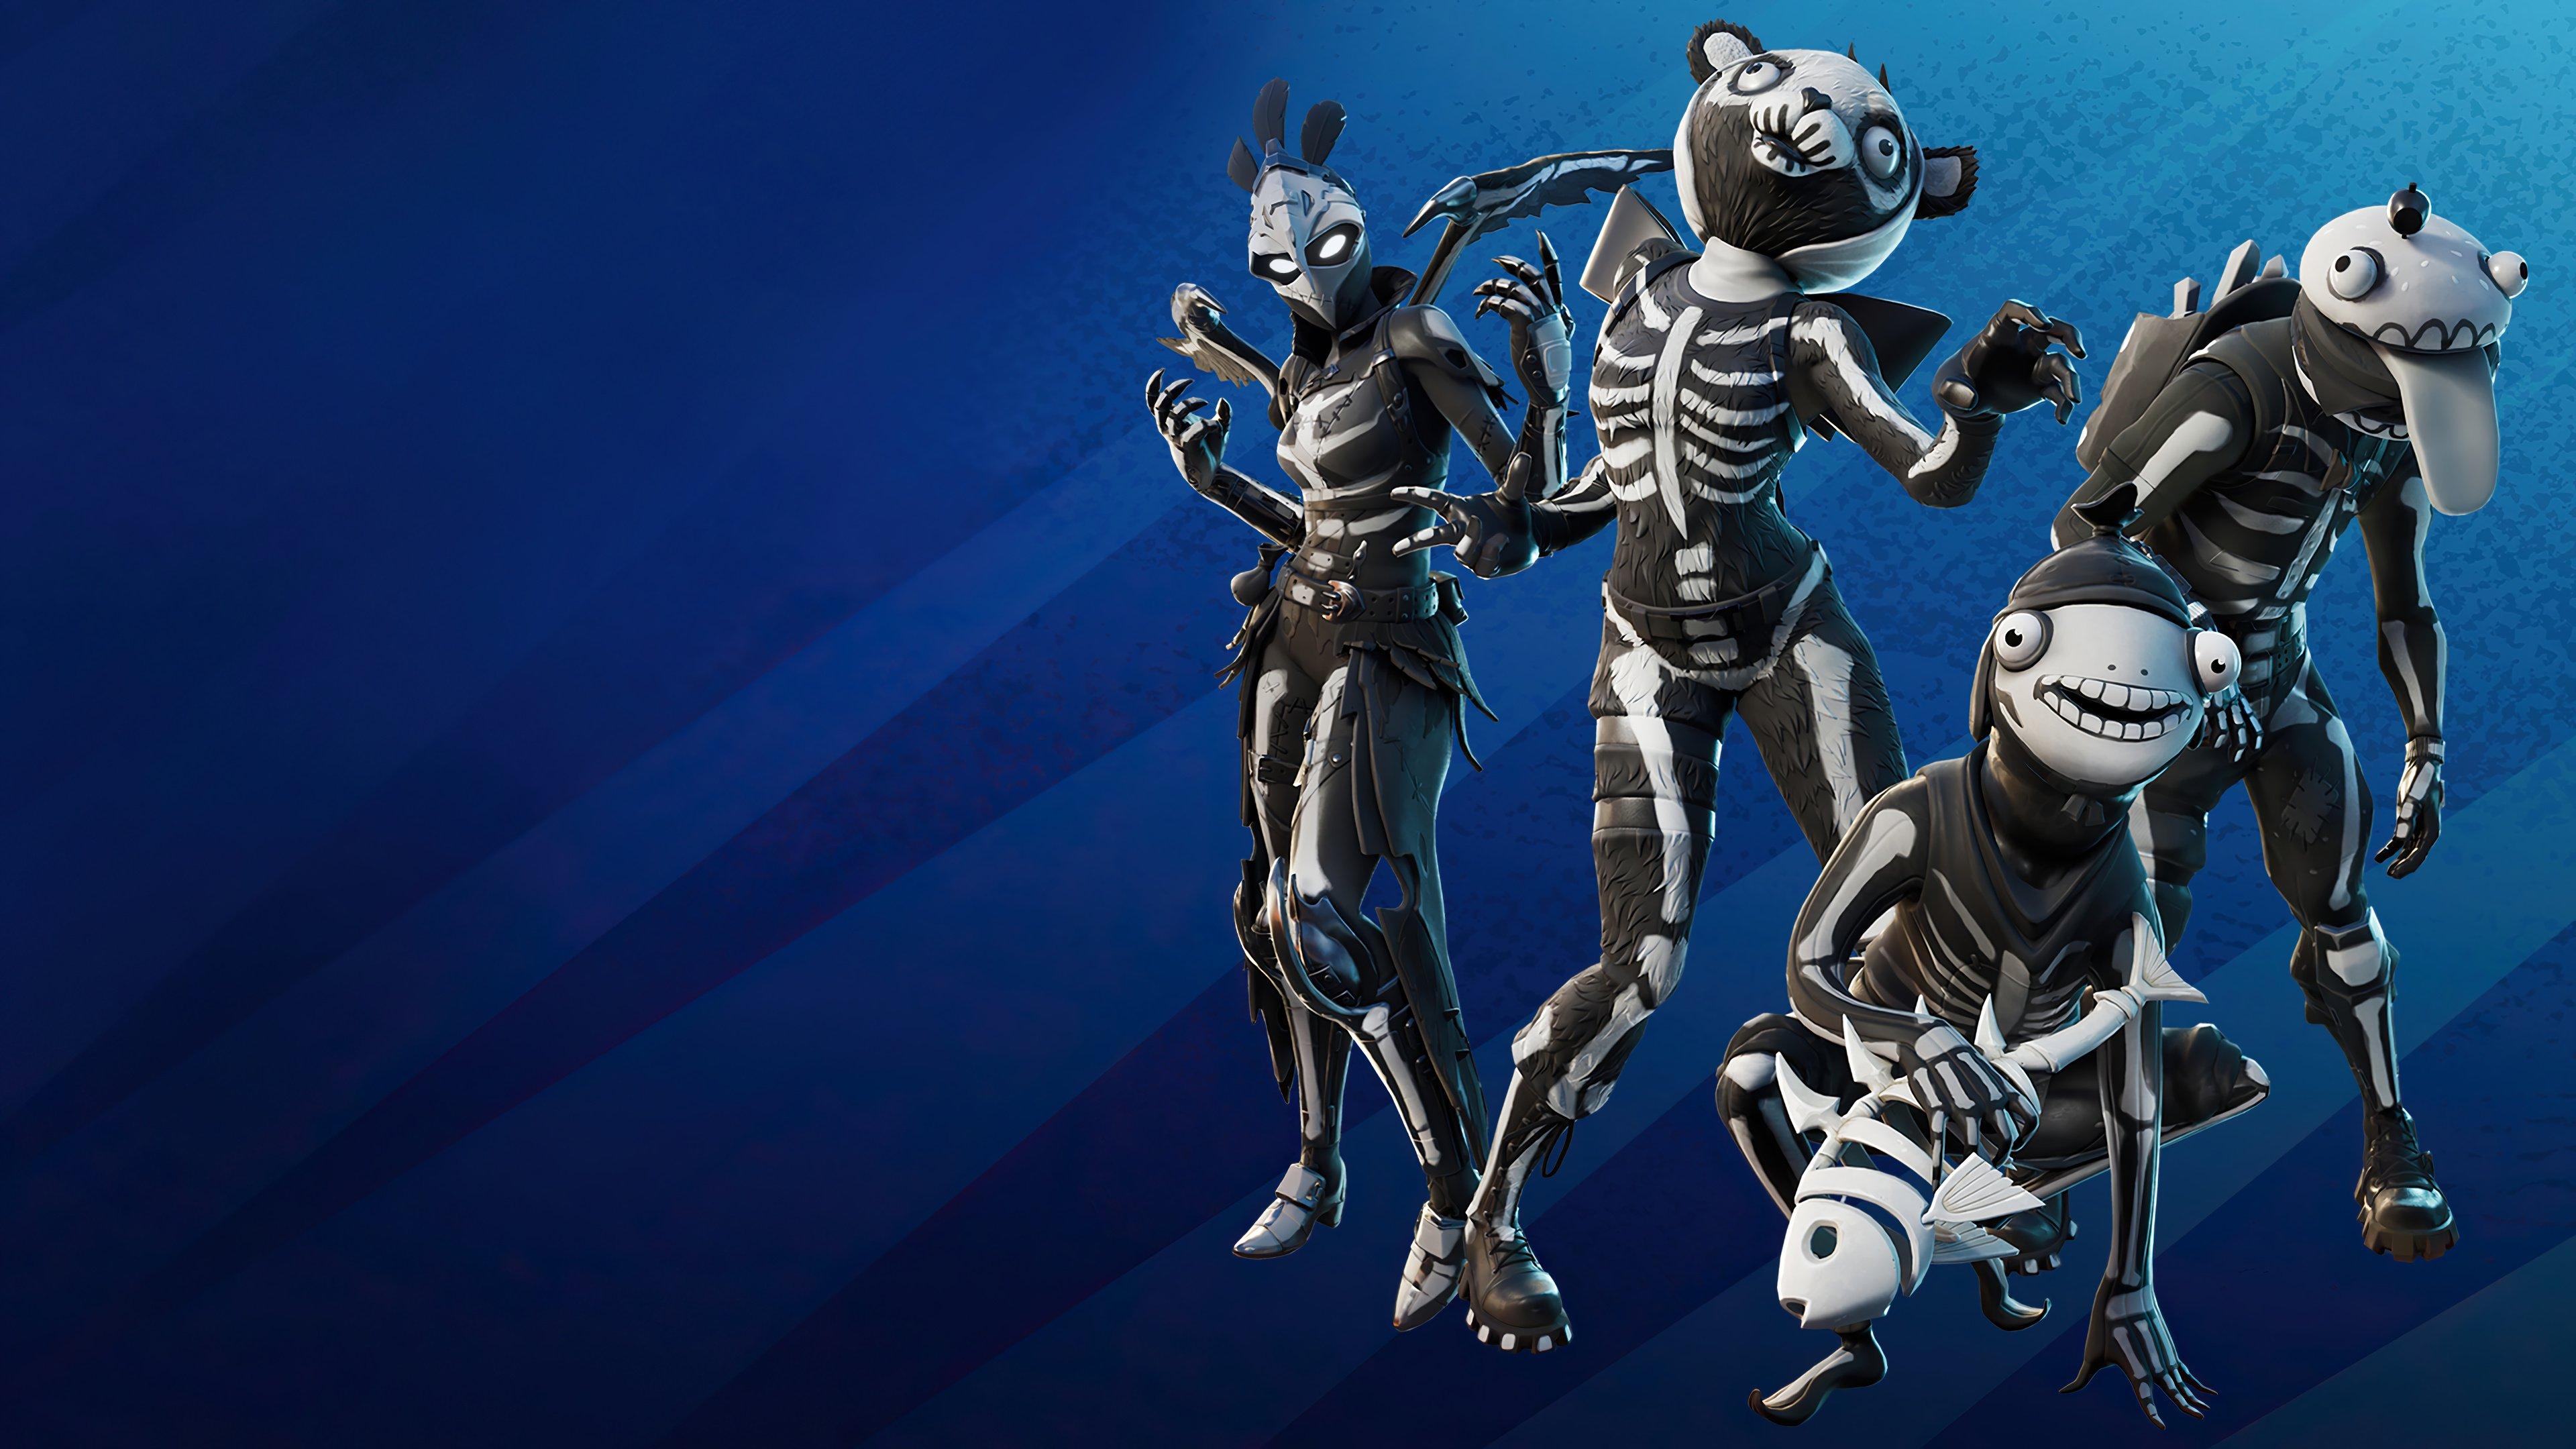 Fondos de pantalla Fortnite Skull squad pack skins Halloween outfits